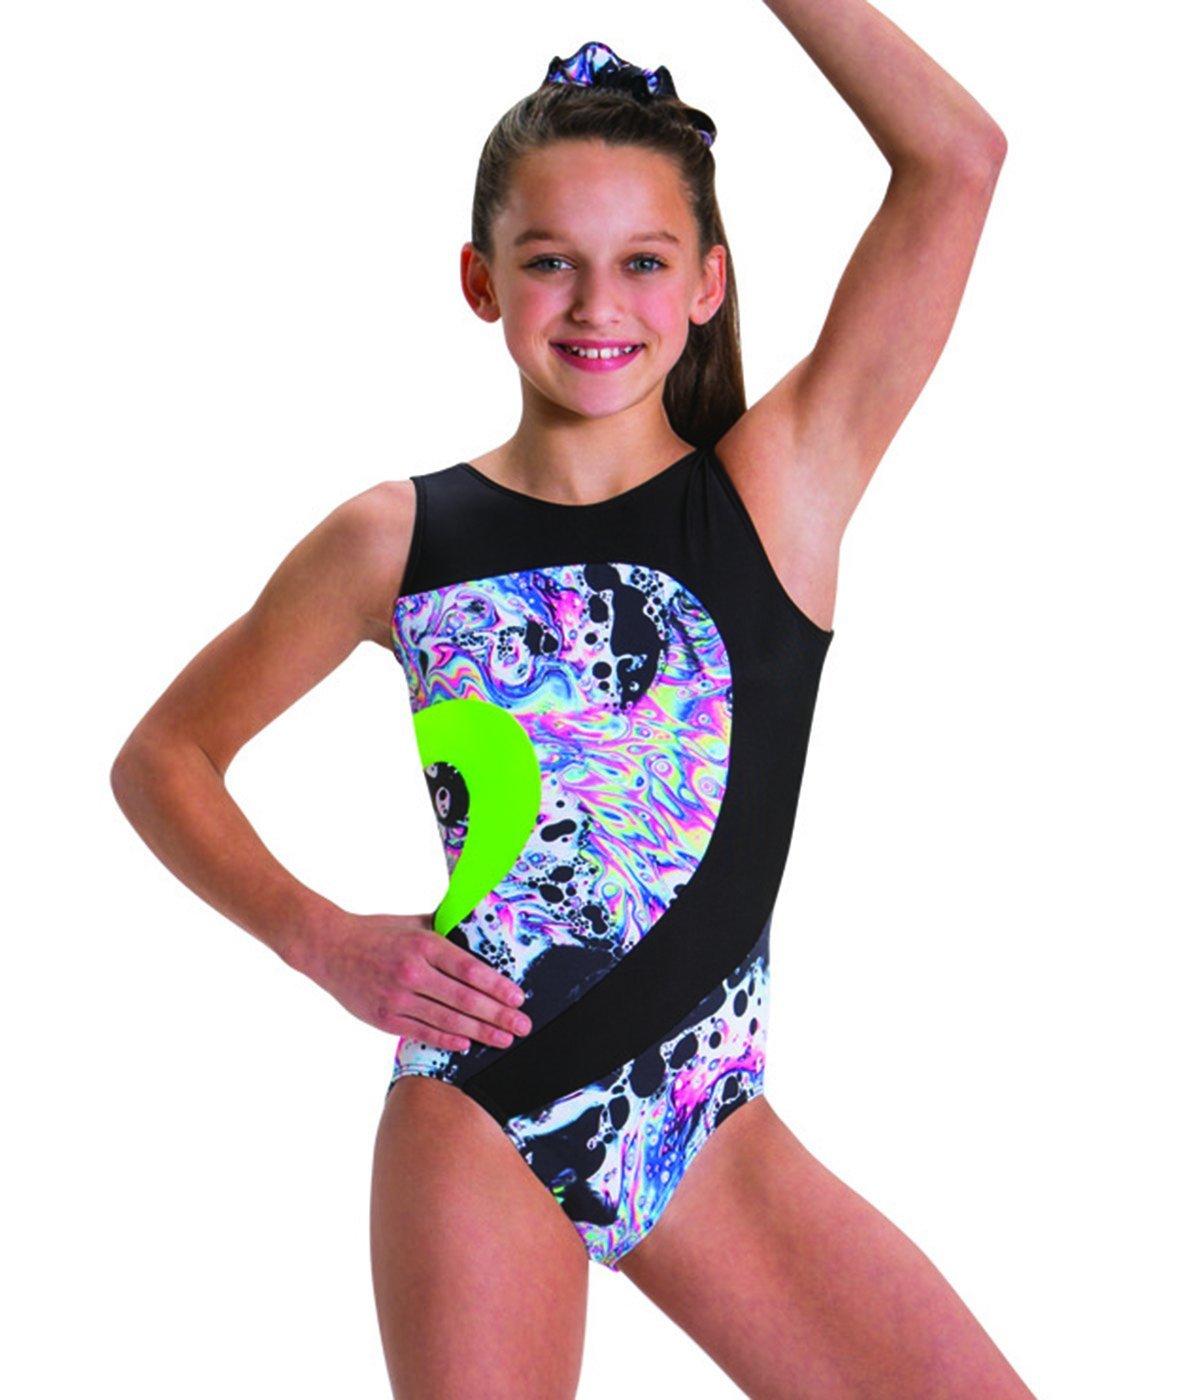 878bb5642b36 Cheap Child Gymnastic Leotard